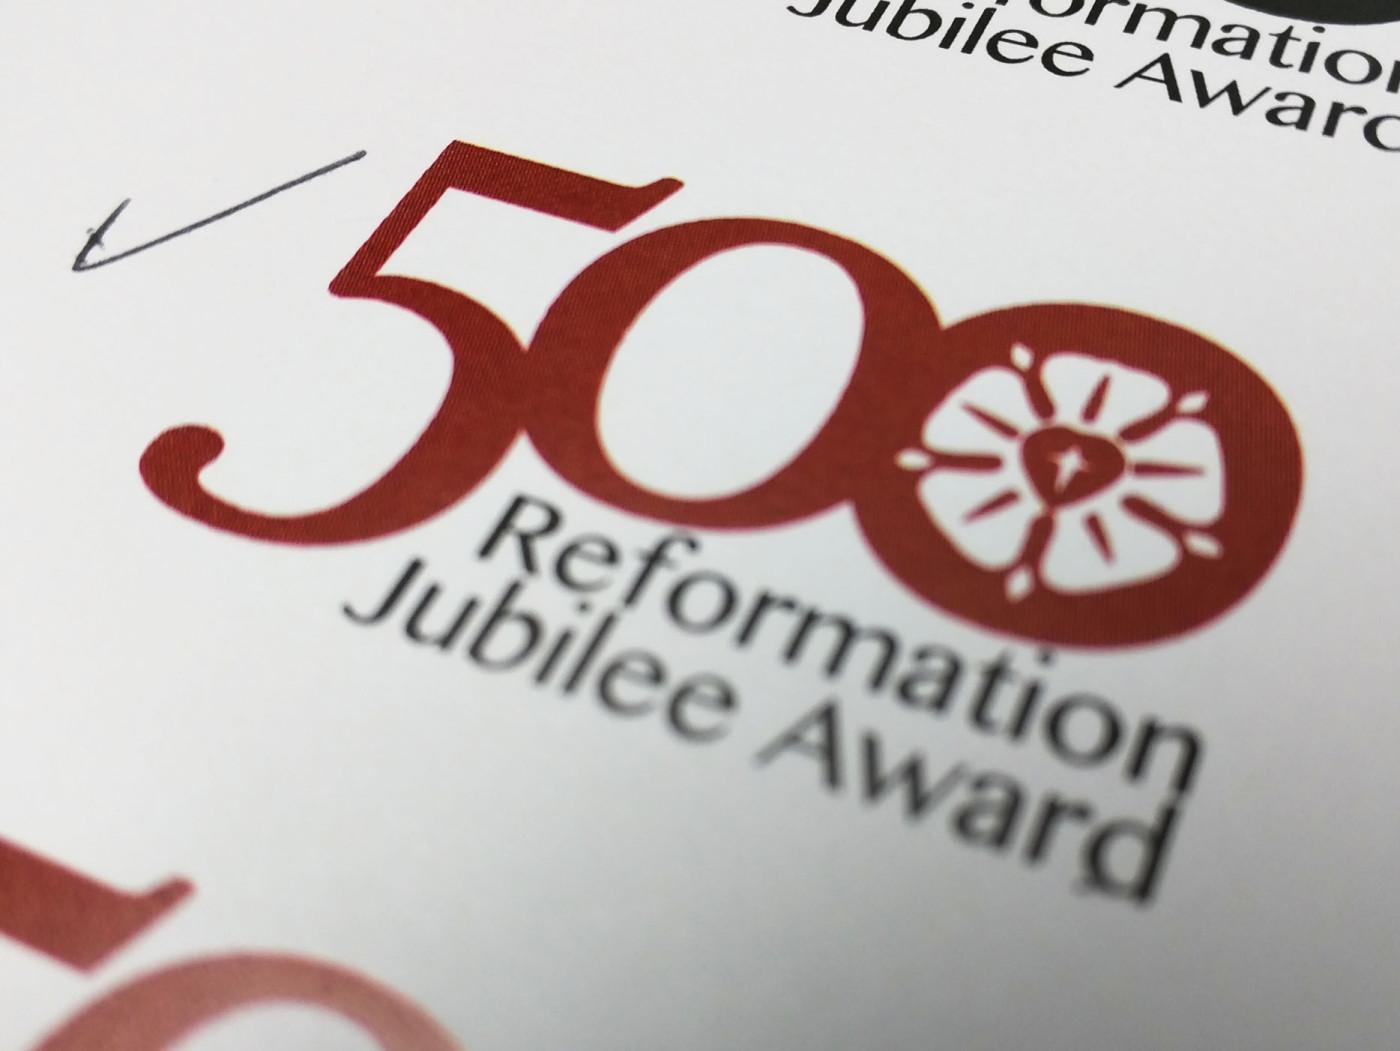 Reformation 500 logo.